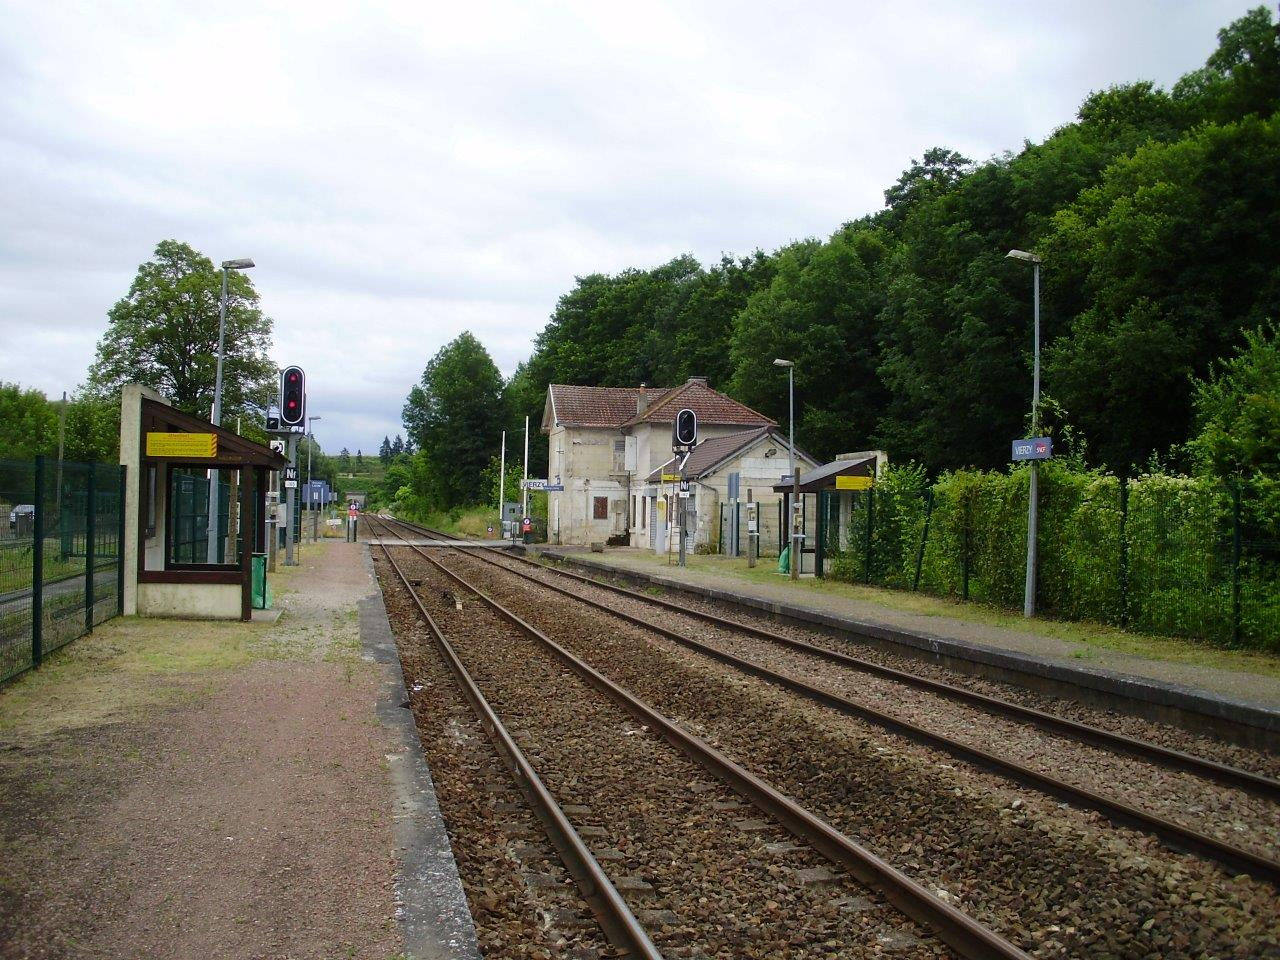 gare-de-vierzy-train-station